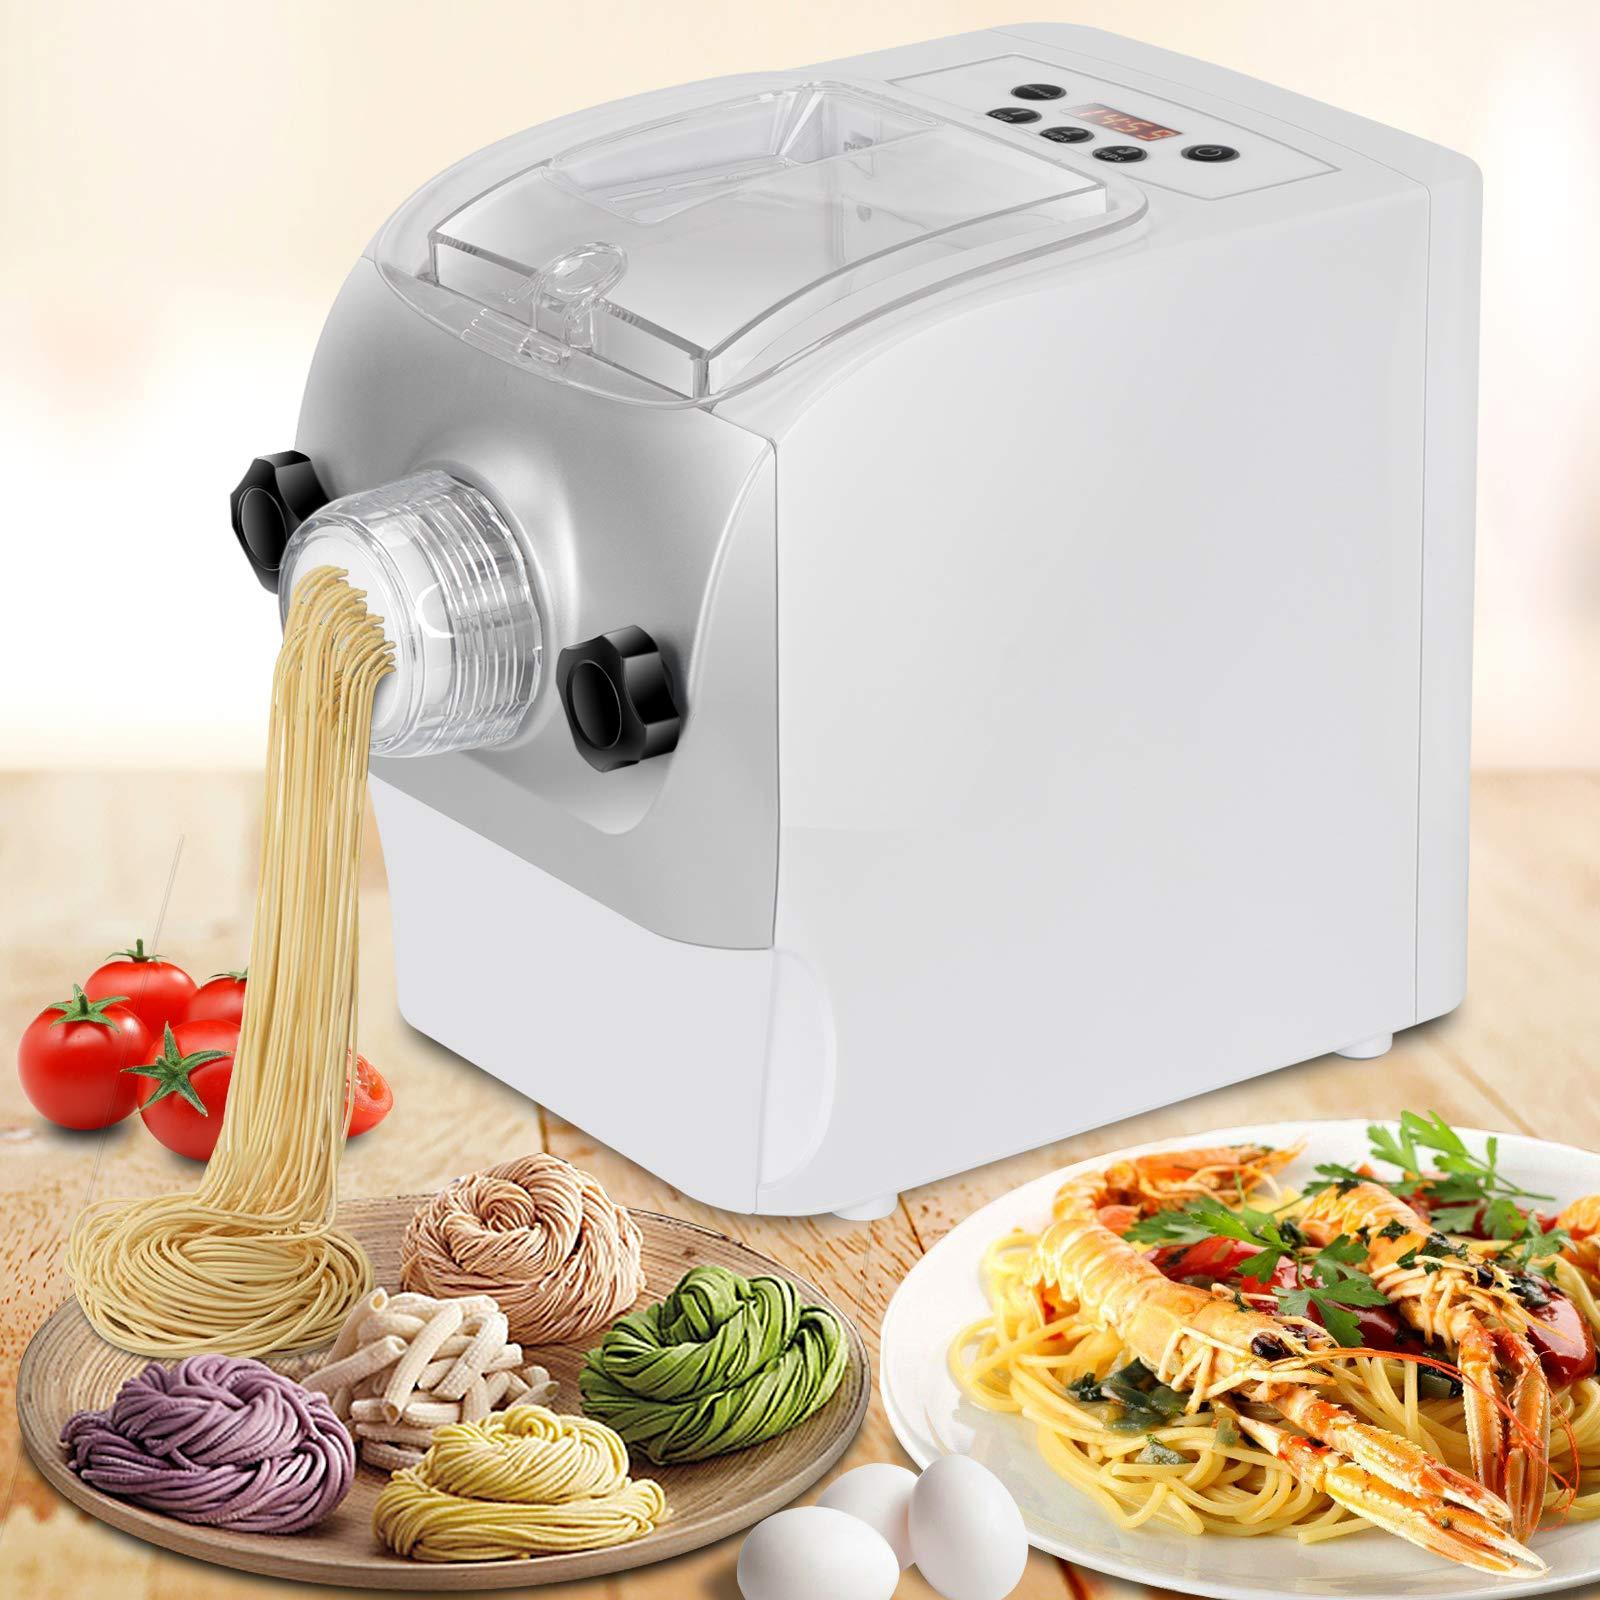 Electric Pasta Maker Automatic Noodle Machine Spaghetti Macaroni Fettuccine Lasagna Bonus Ravioli Sausage Maker with Mixes, Kneads & Extrudes by ZENSTYLE